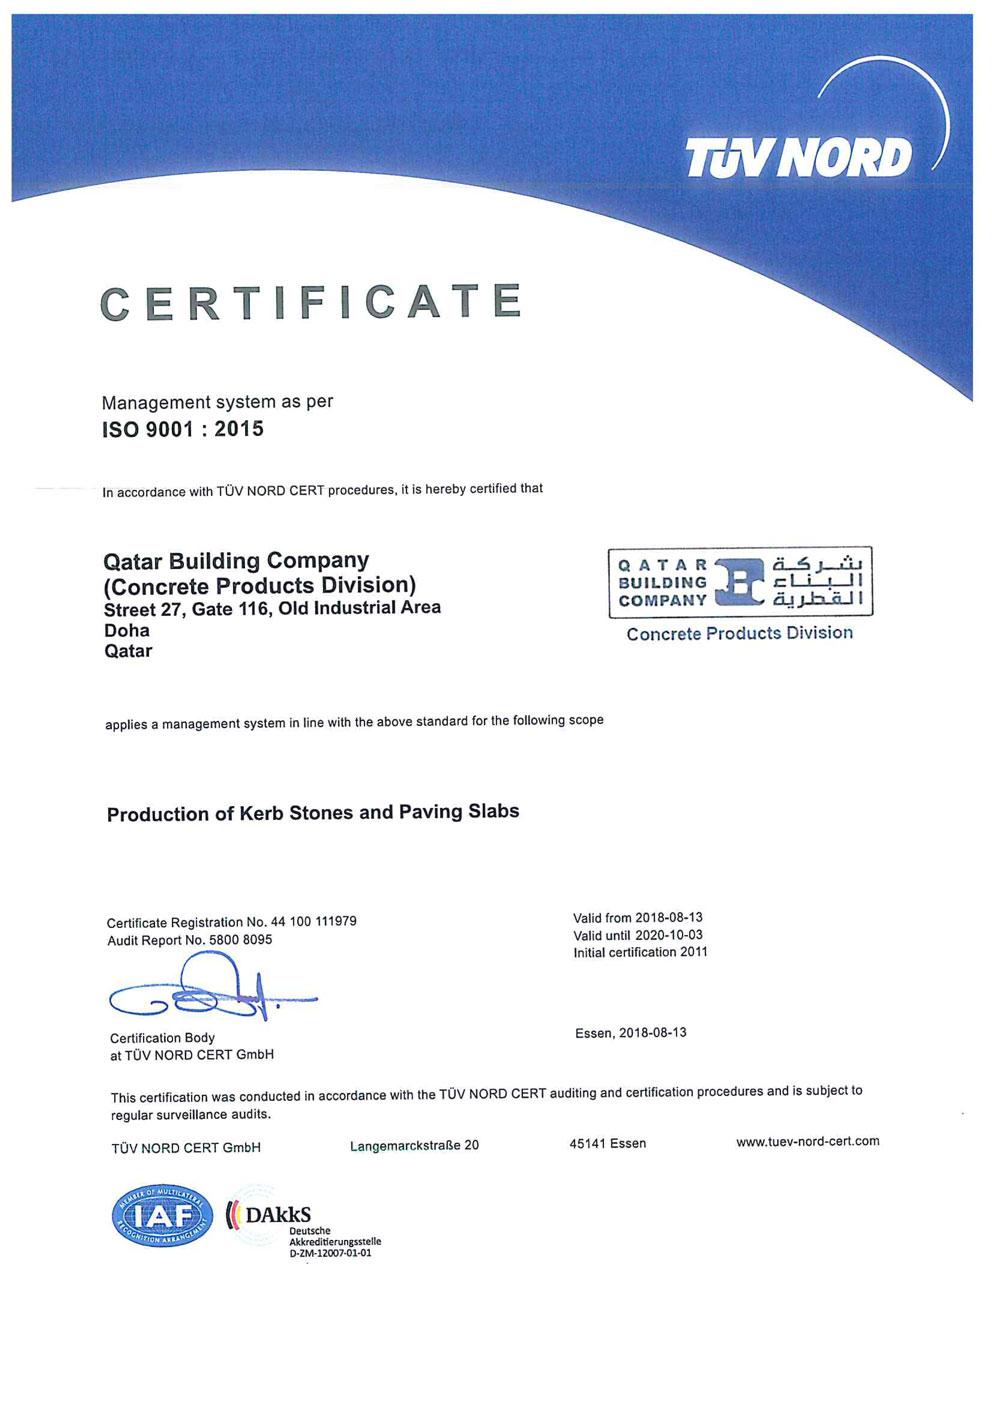 Qatar-Building-Company-ISO-9001-2015